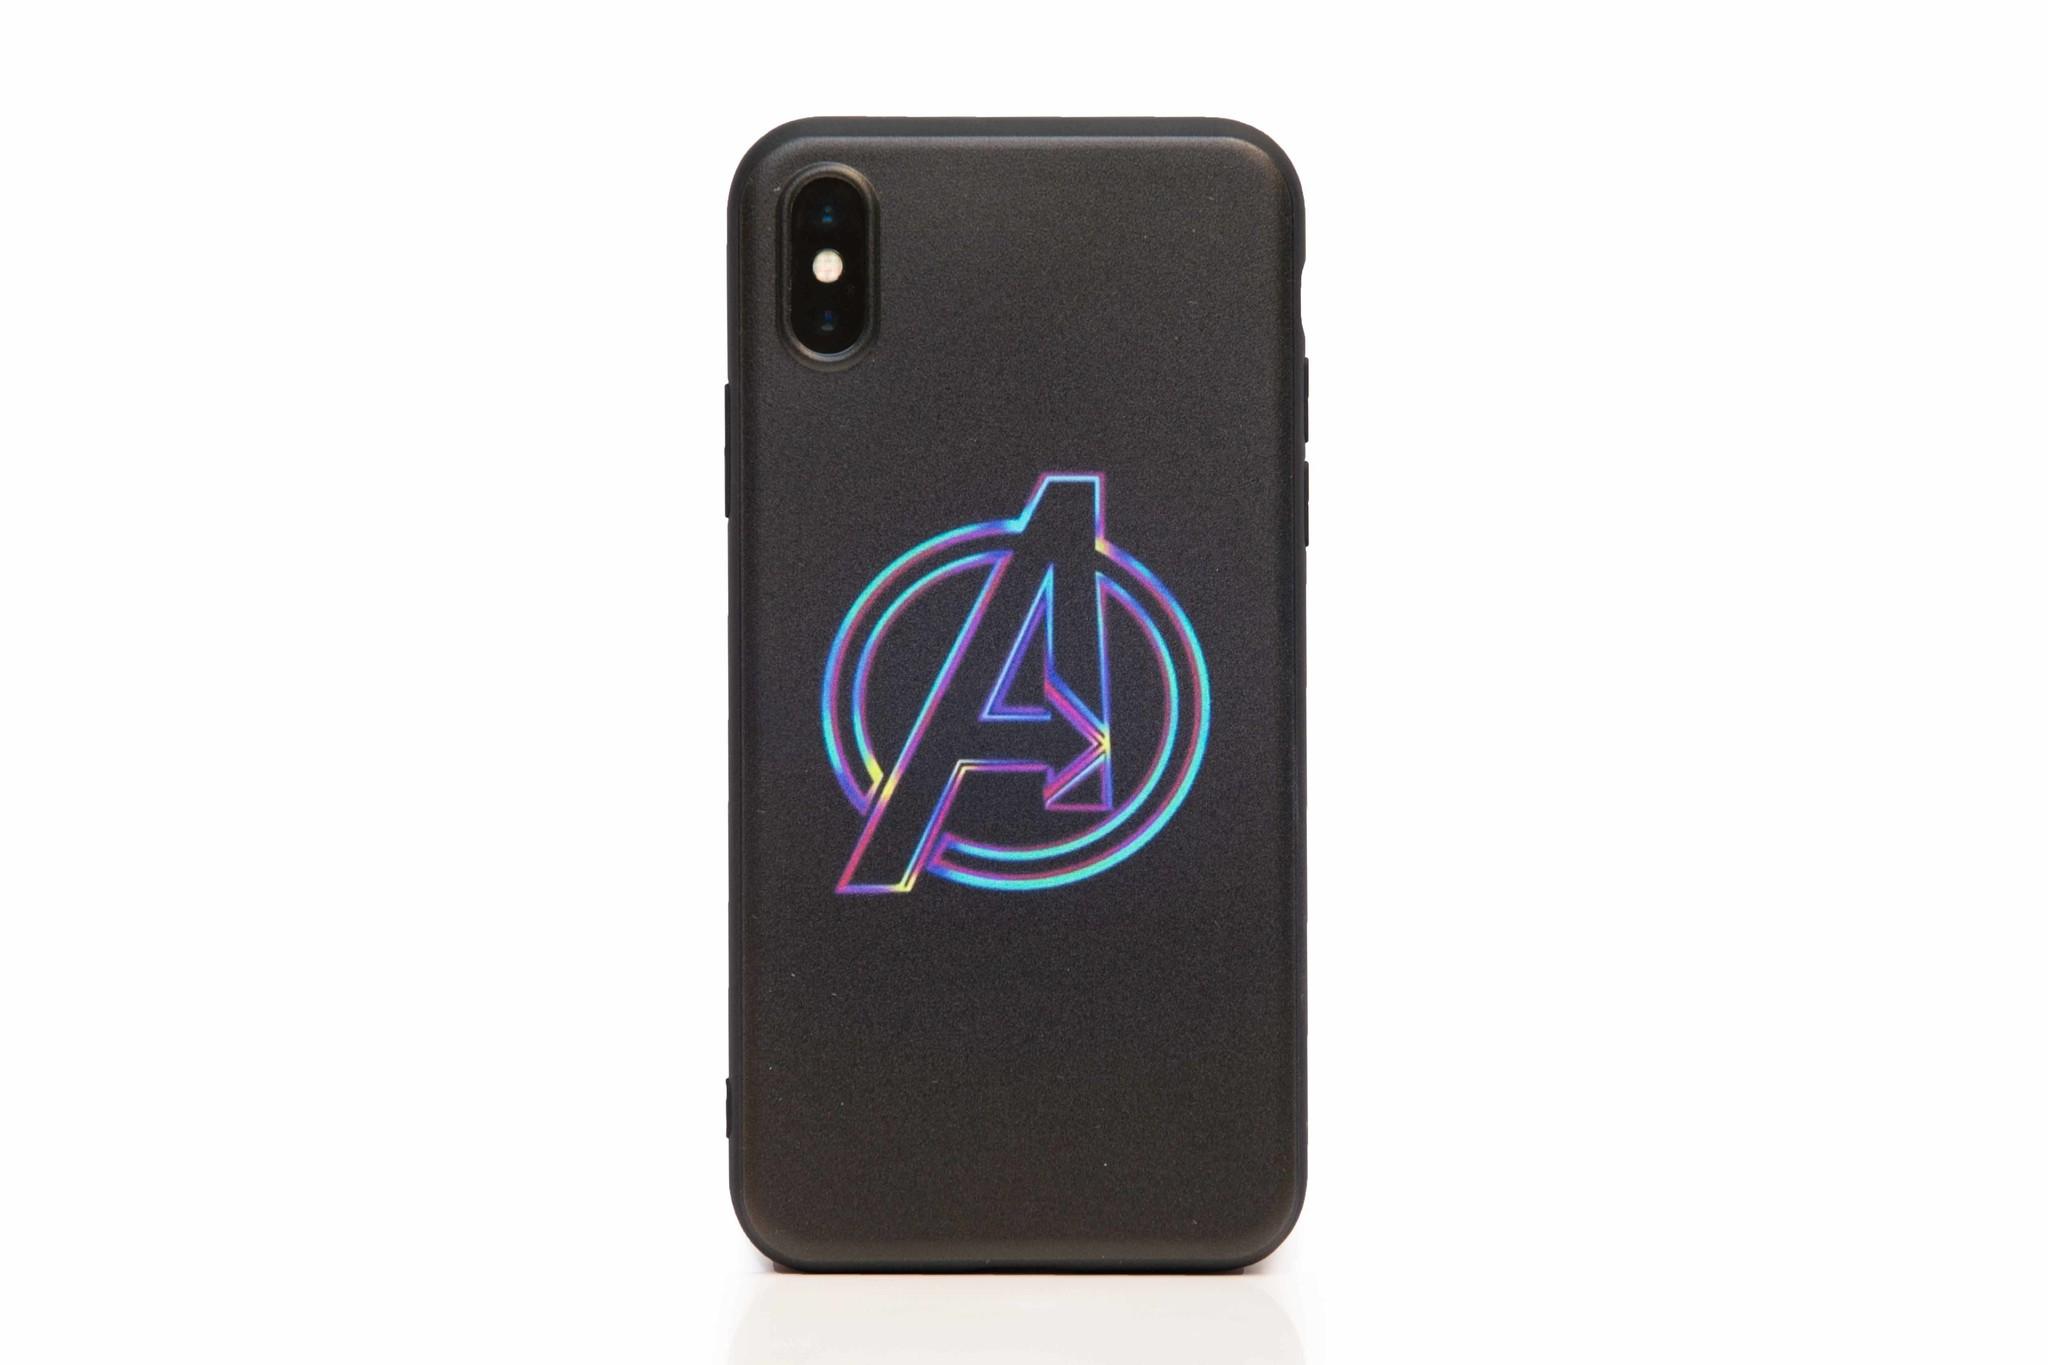 Smartphonehoesje iPhone X / XS | Marvel (Avengers logo)